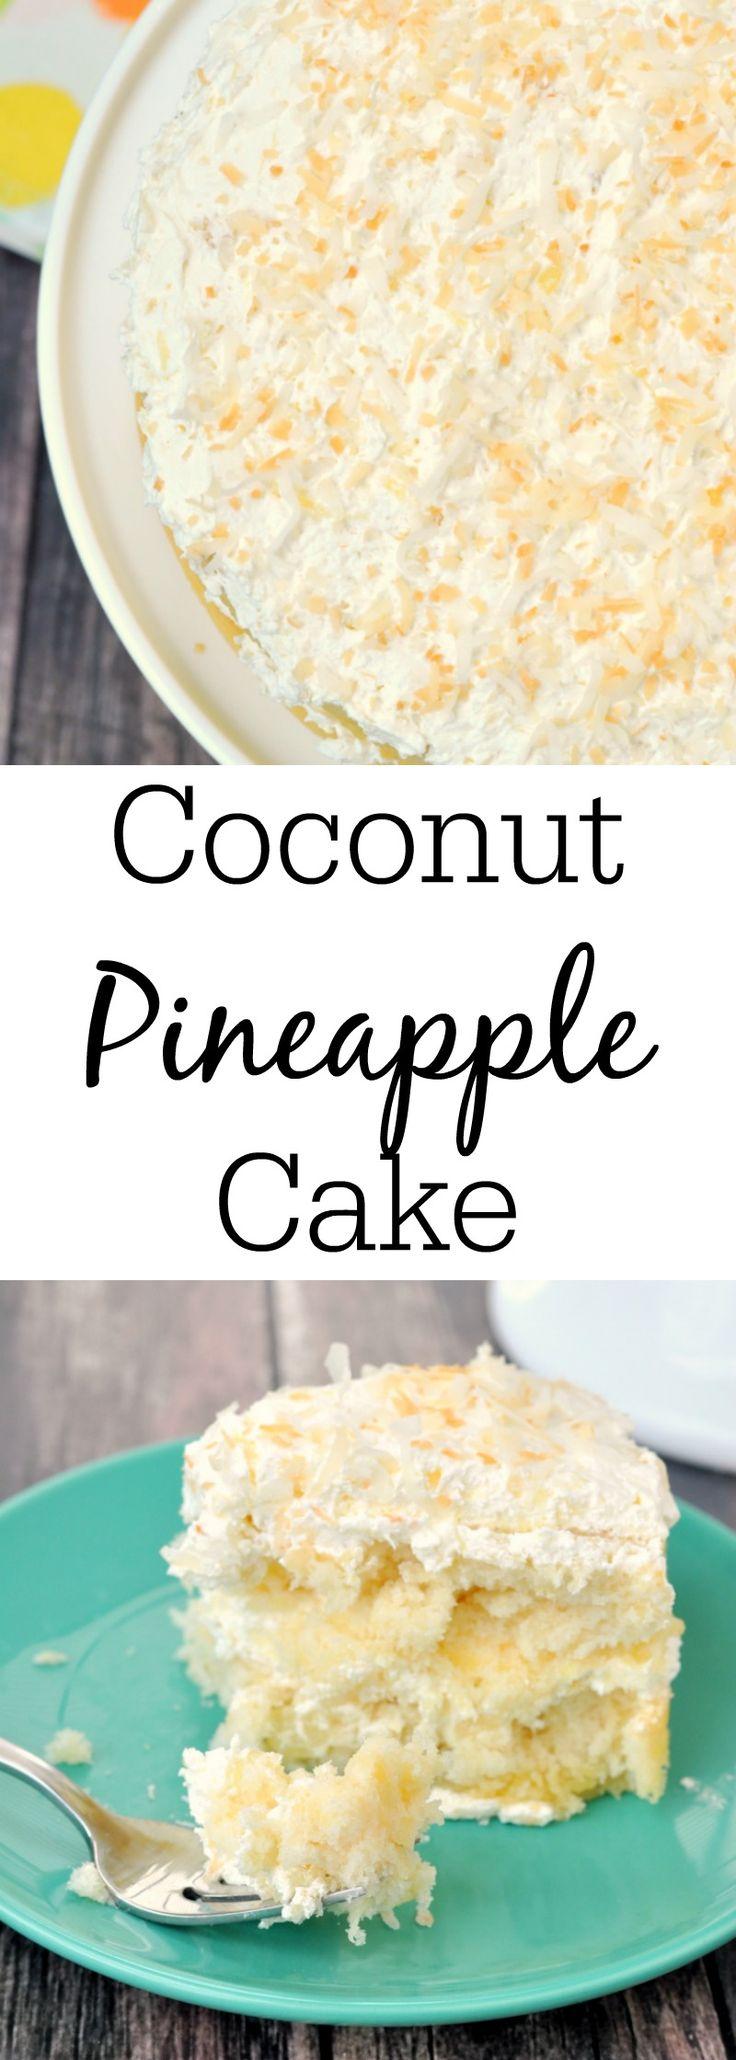 Grandma's Famous Coconut Pineapple Cake